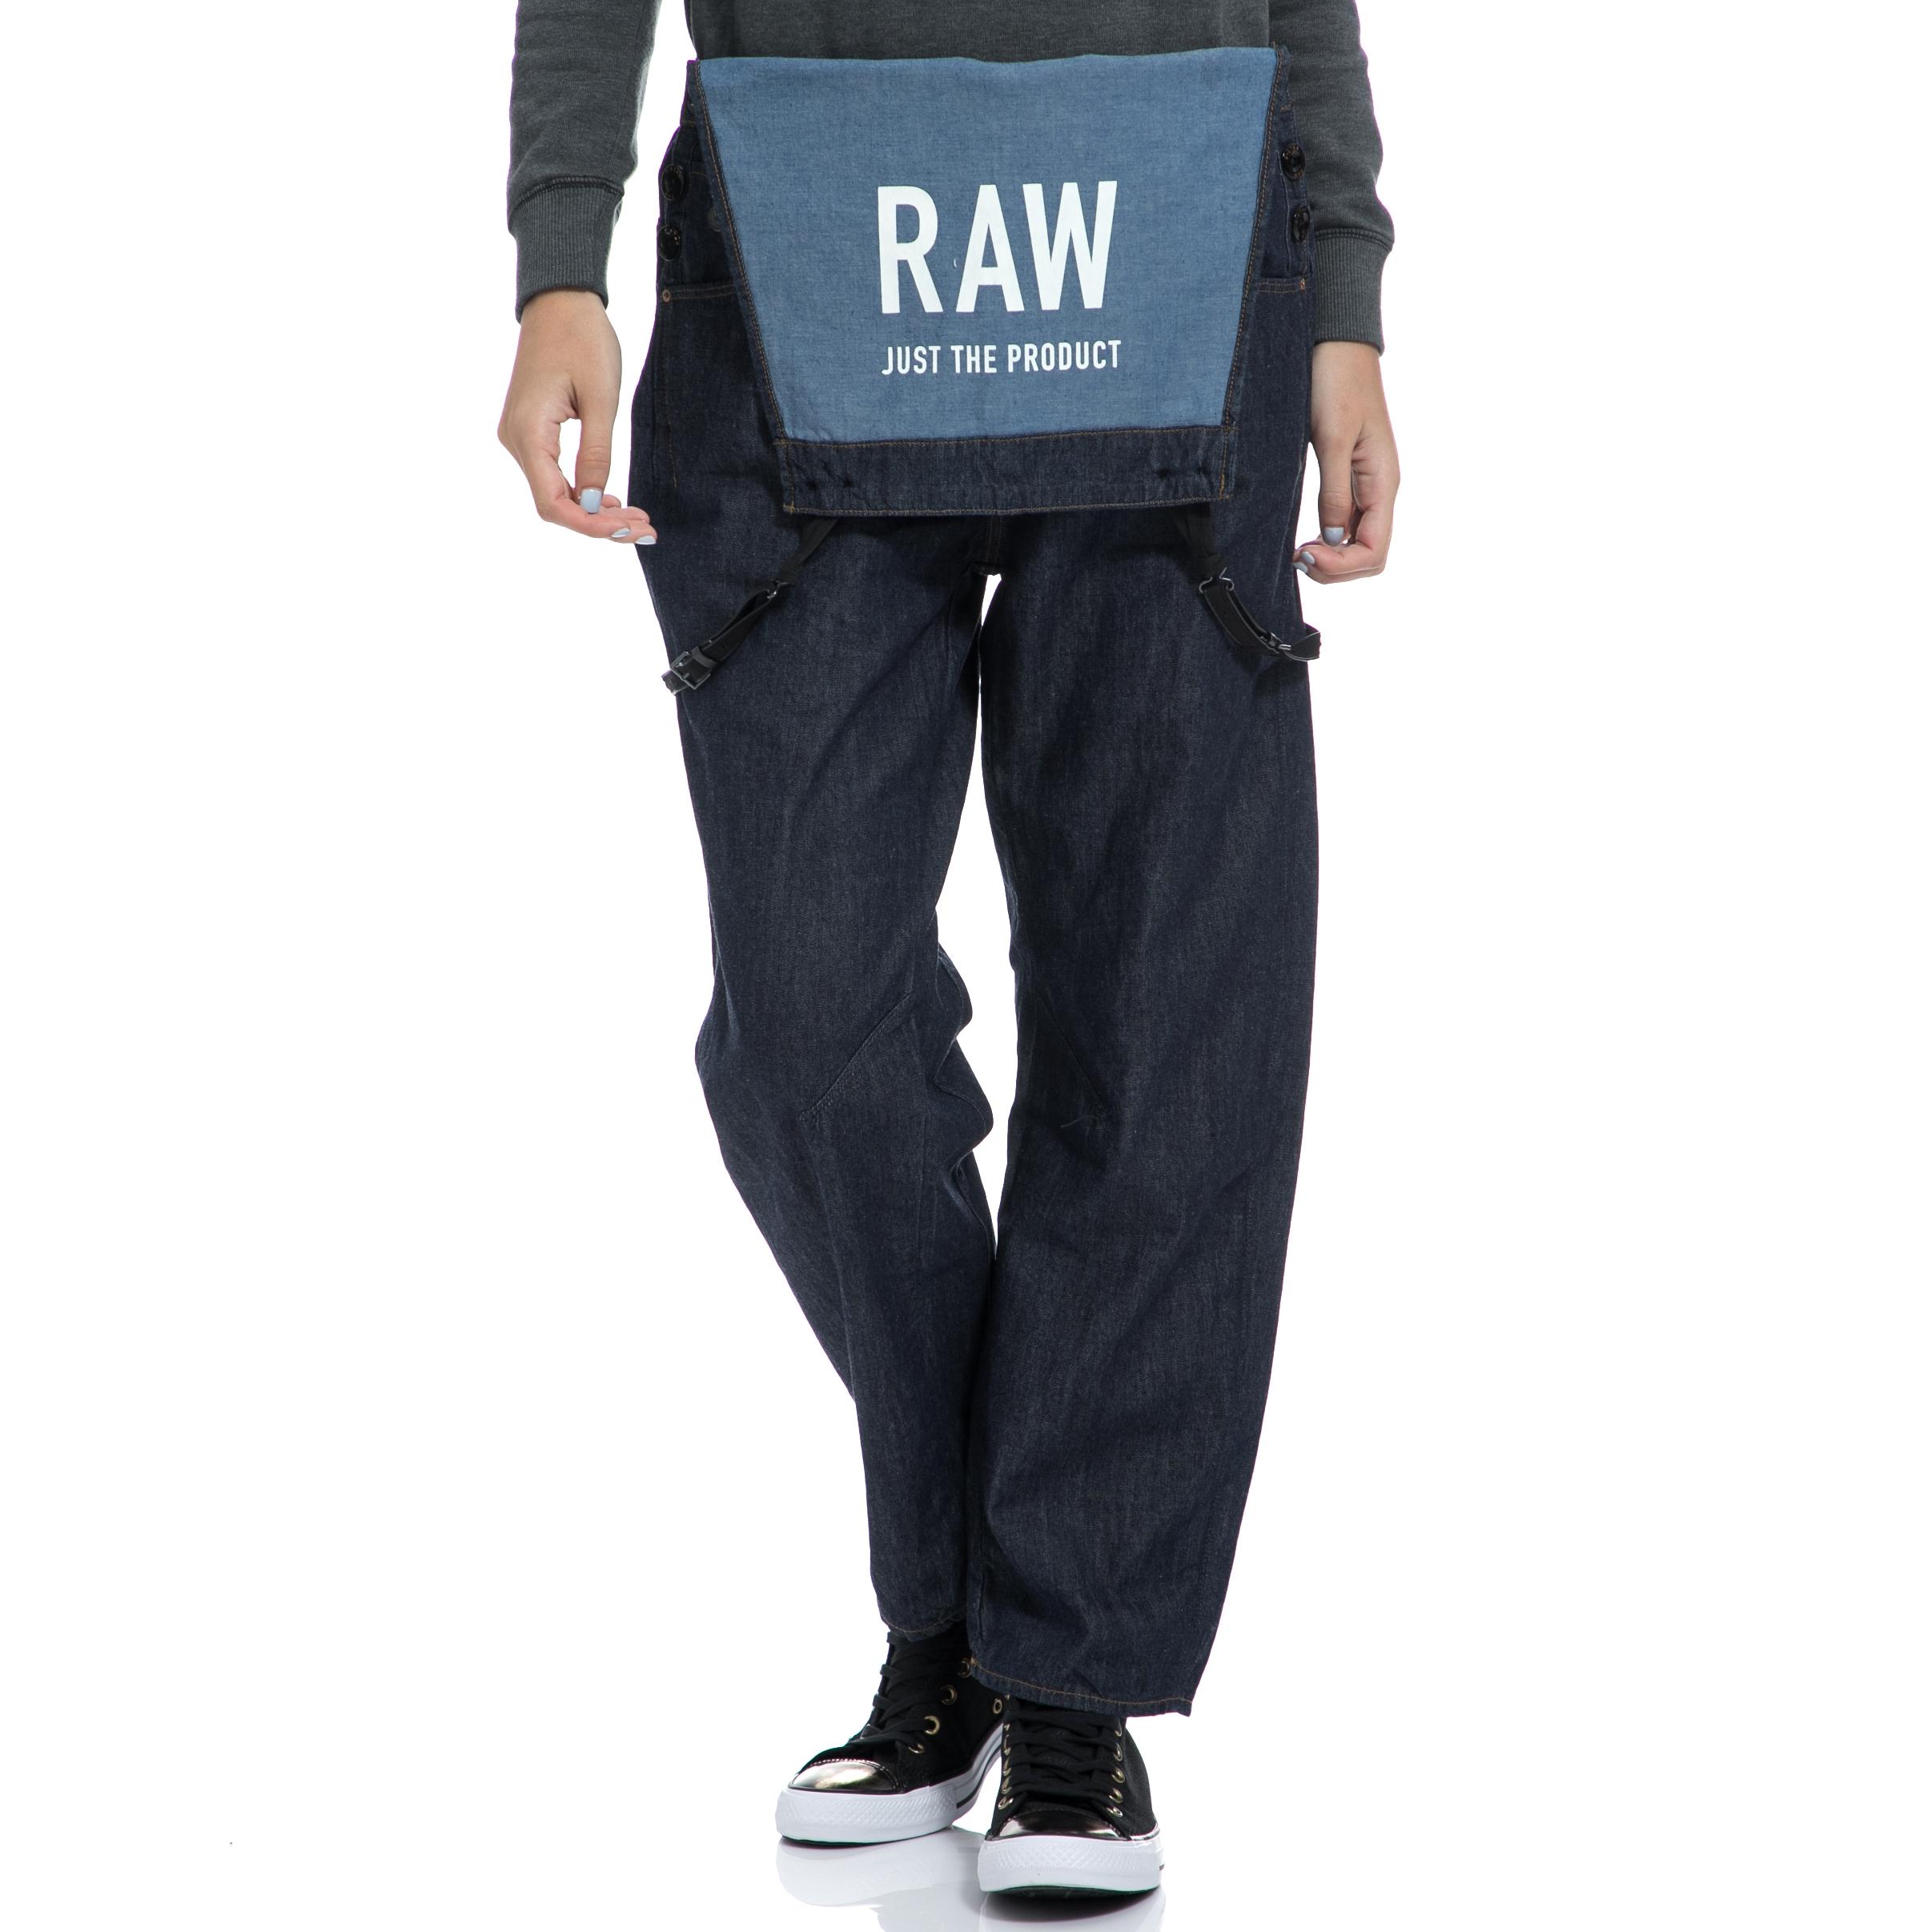 5a9094233c03 G-STAR RAW - Γυναικεία σαλοπέτα G-STAR RAW μπλε